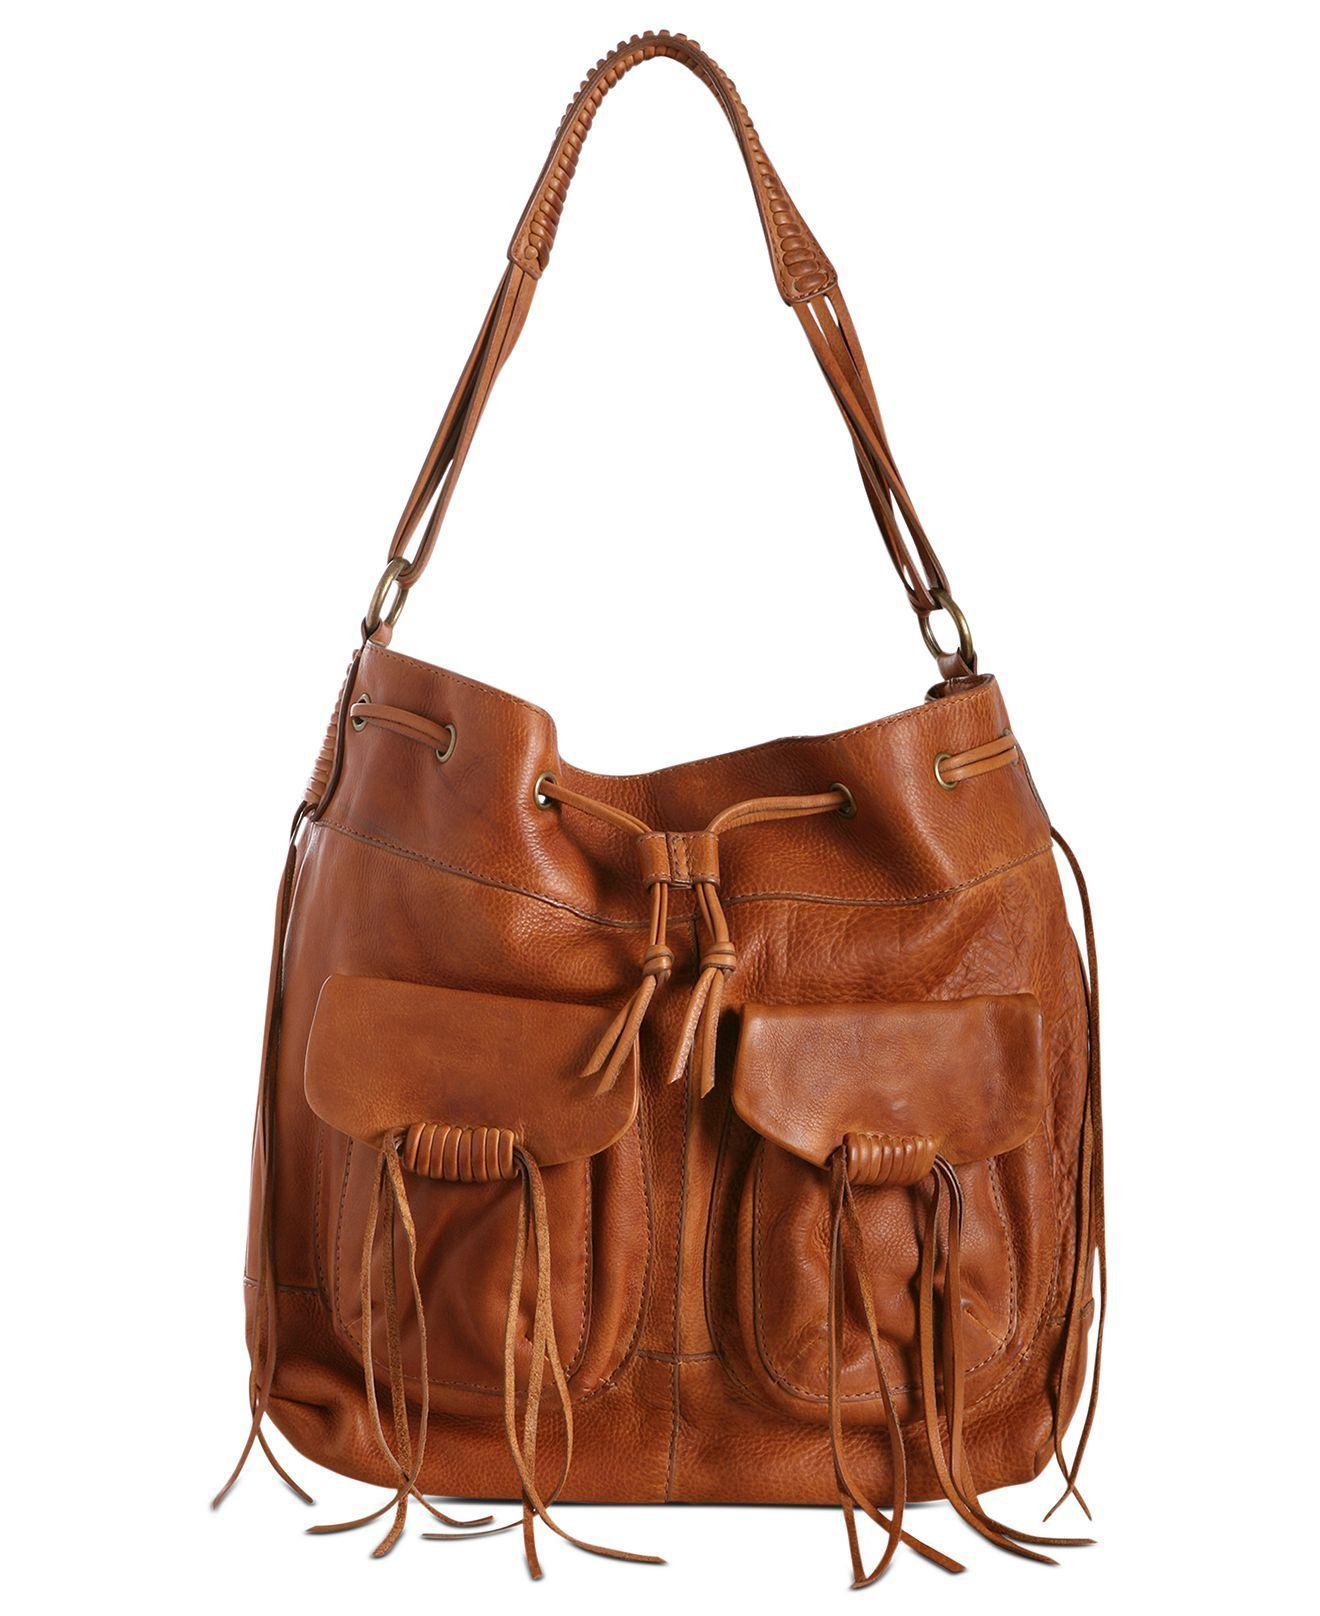 Lucky Brand Handbag Jordana Hobo Handbags Accessories Macy S